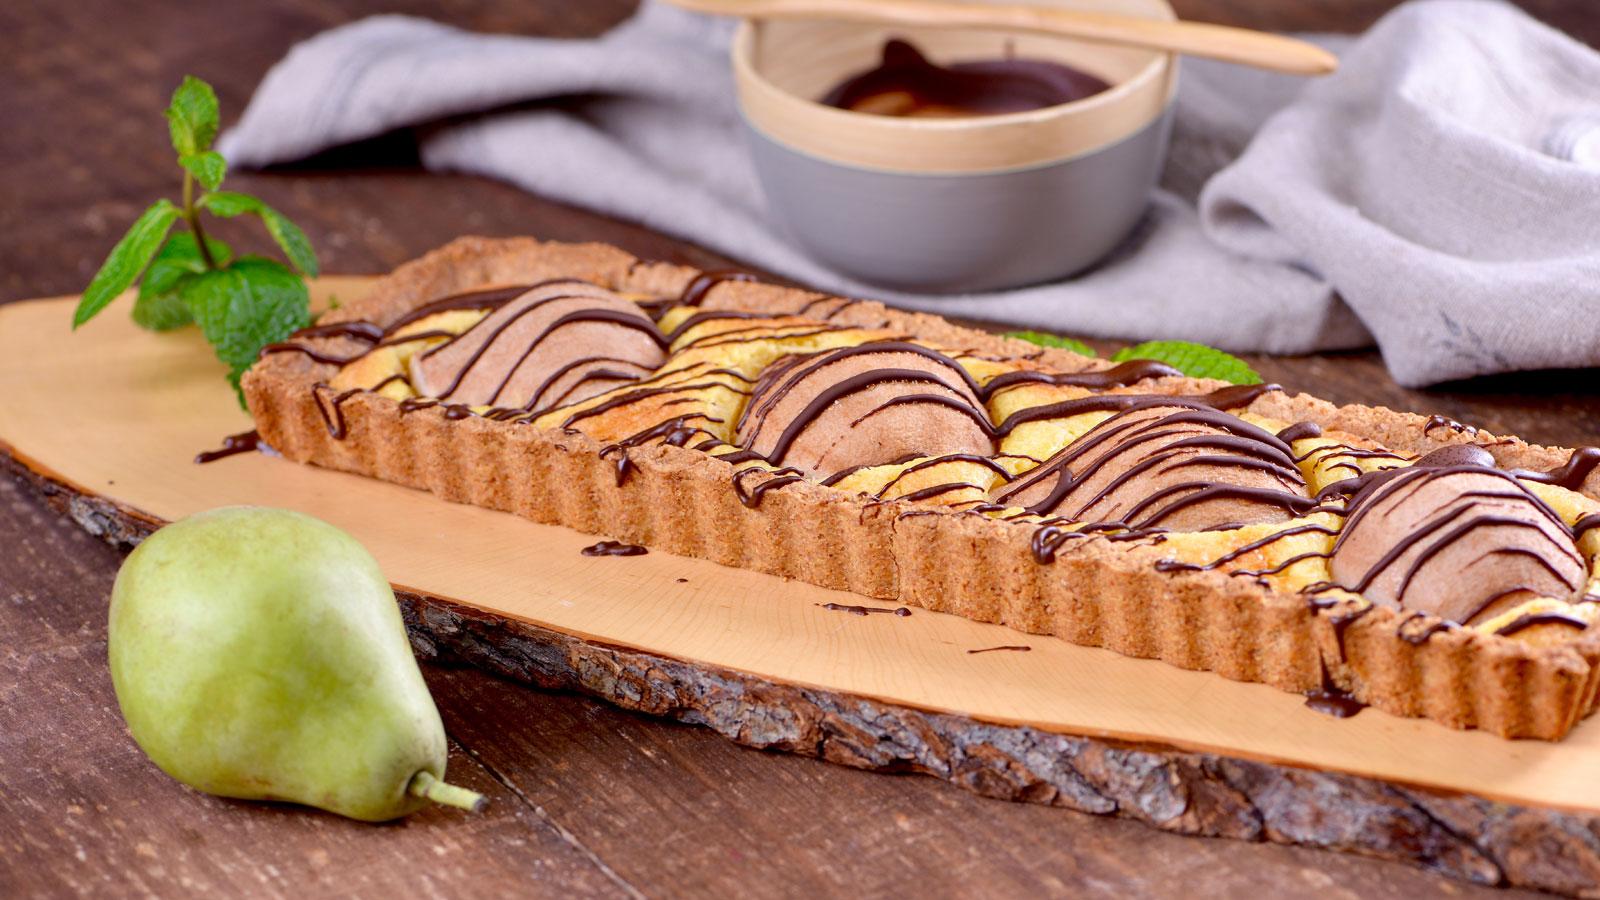 Tarta De Peras Y Chocolate Caliente Amanda Laporte